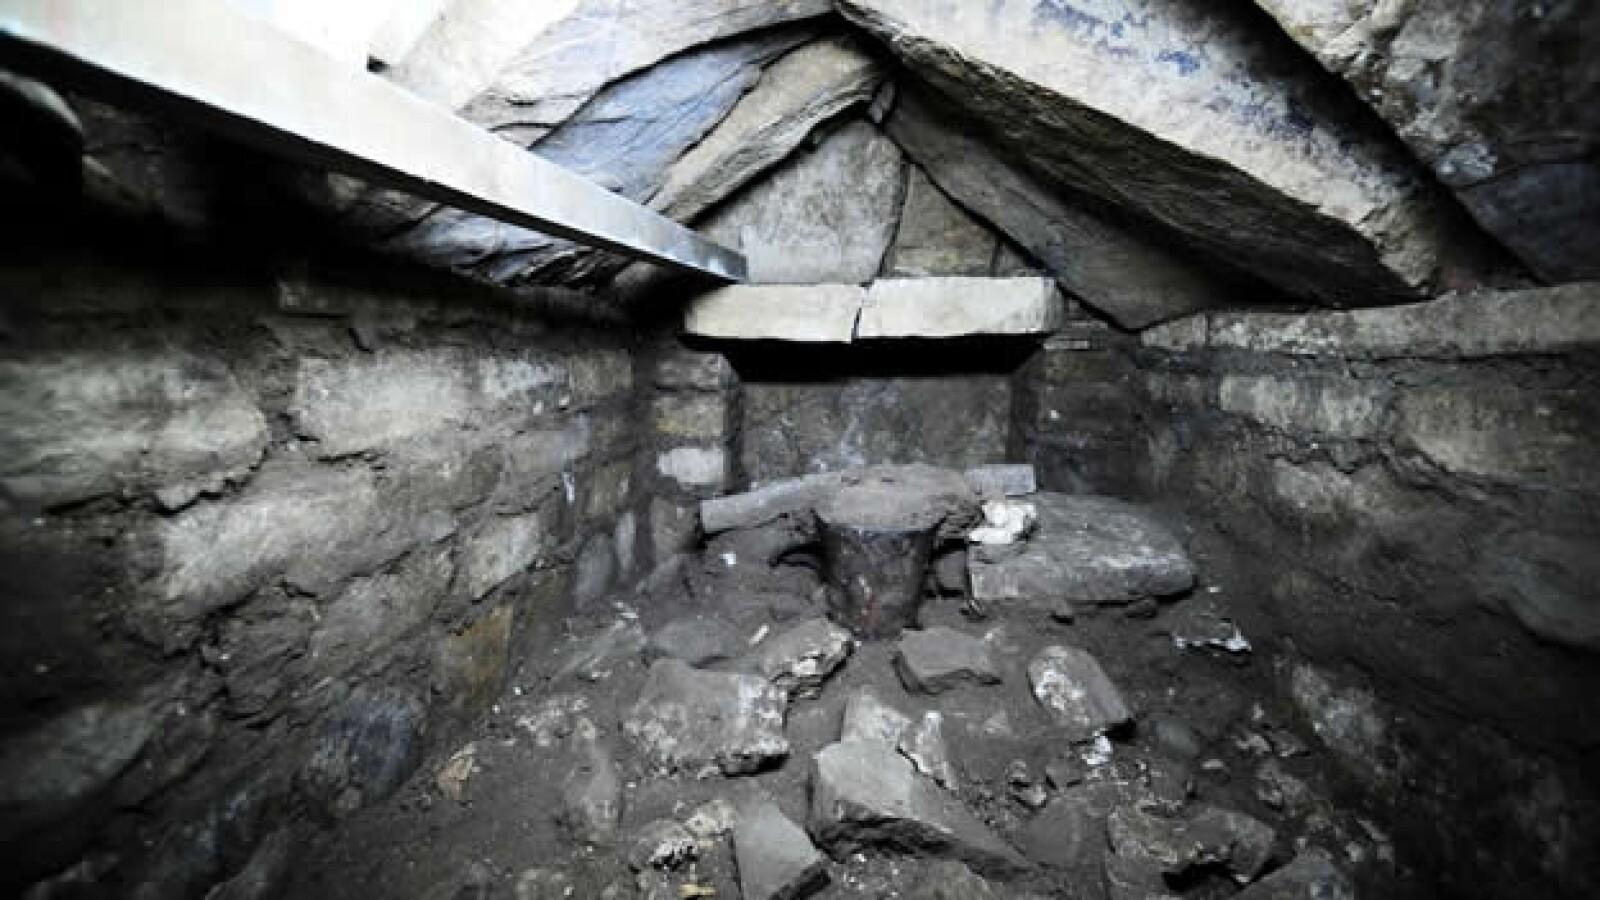 entierro zapoteca en oaxaca